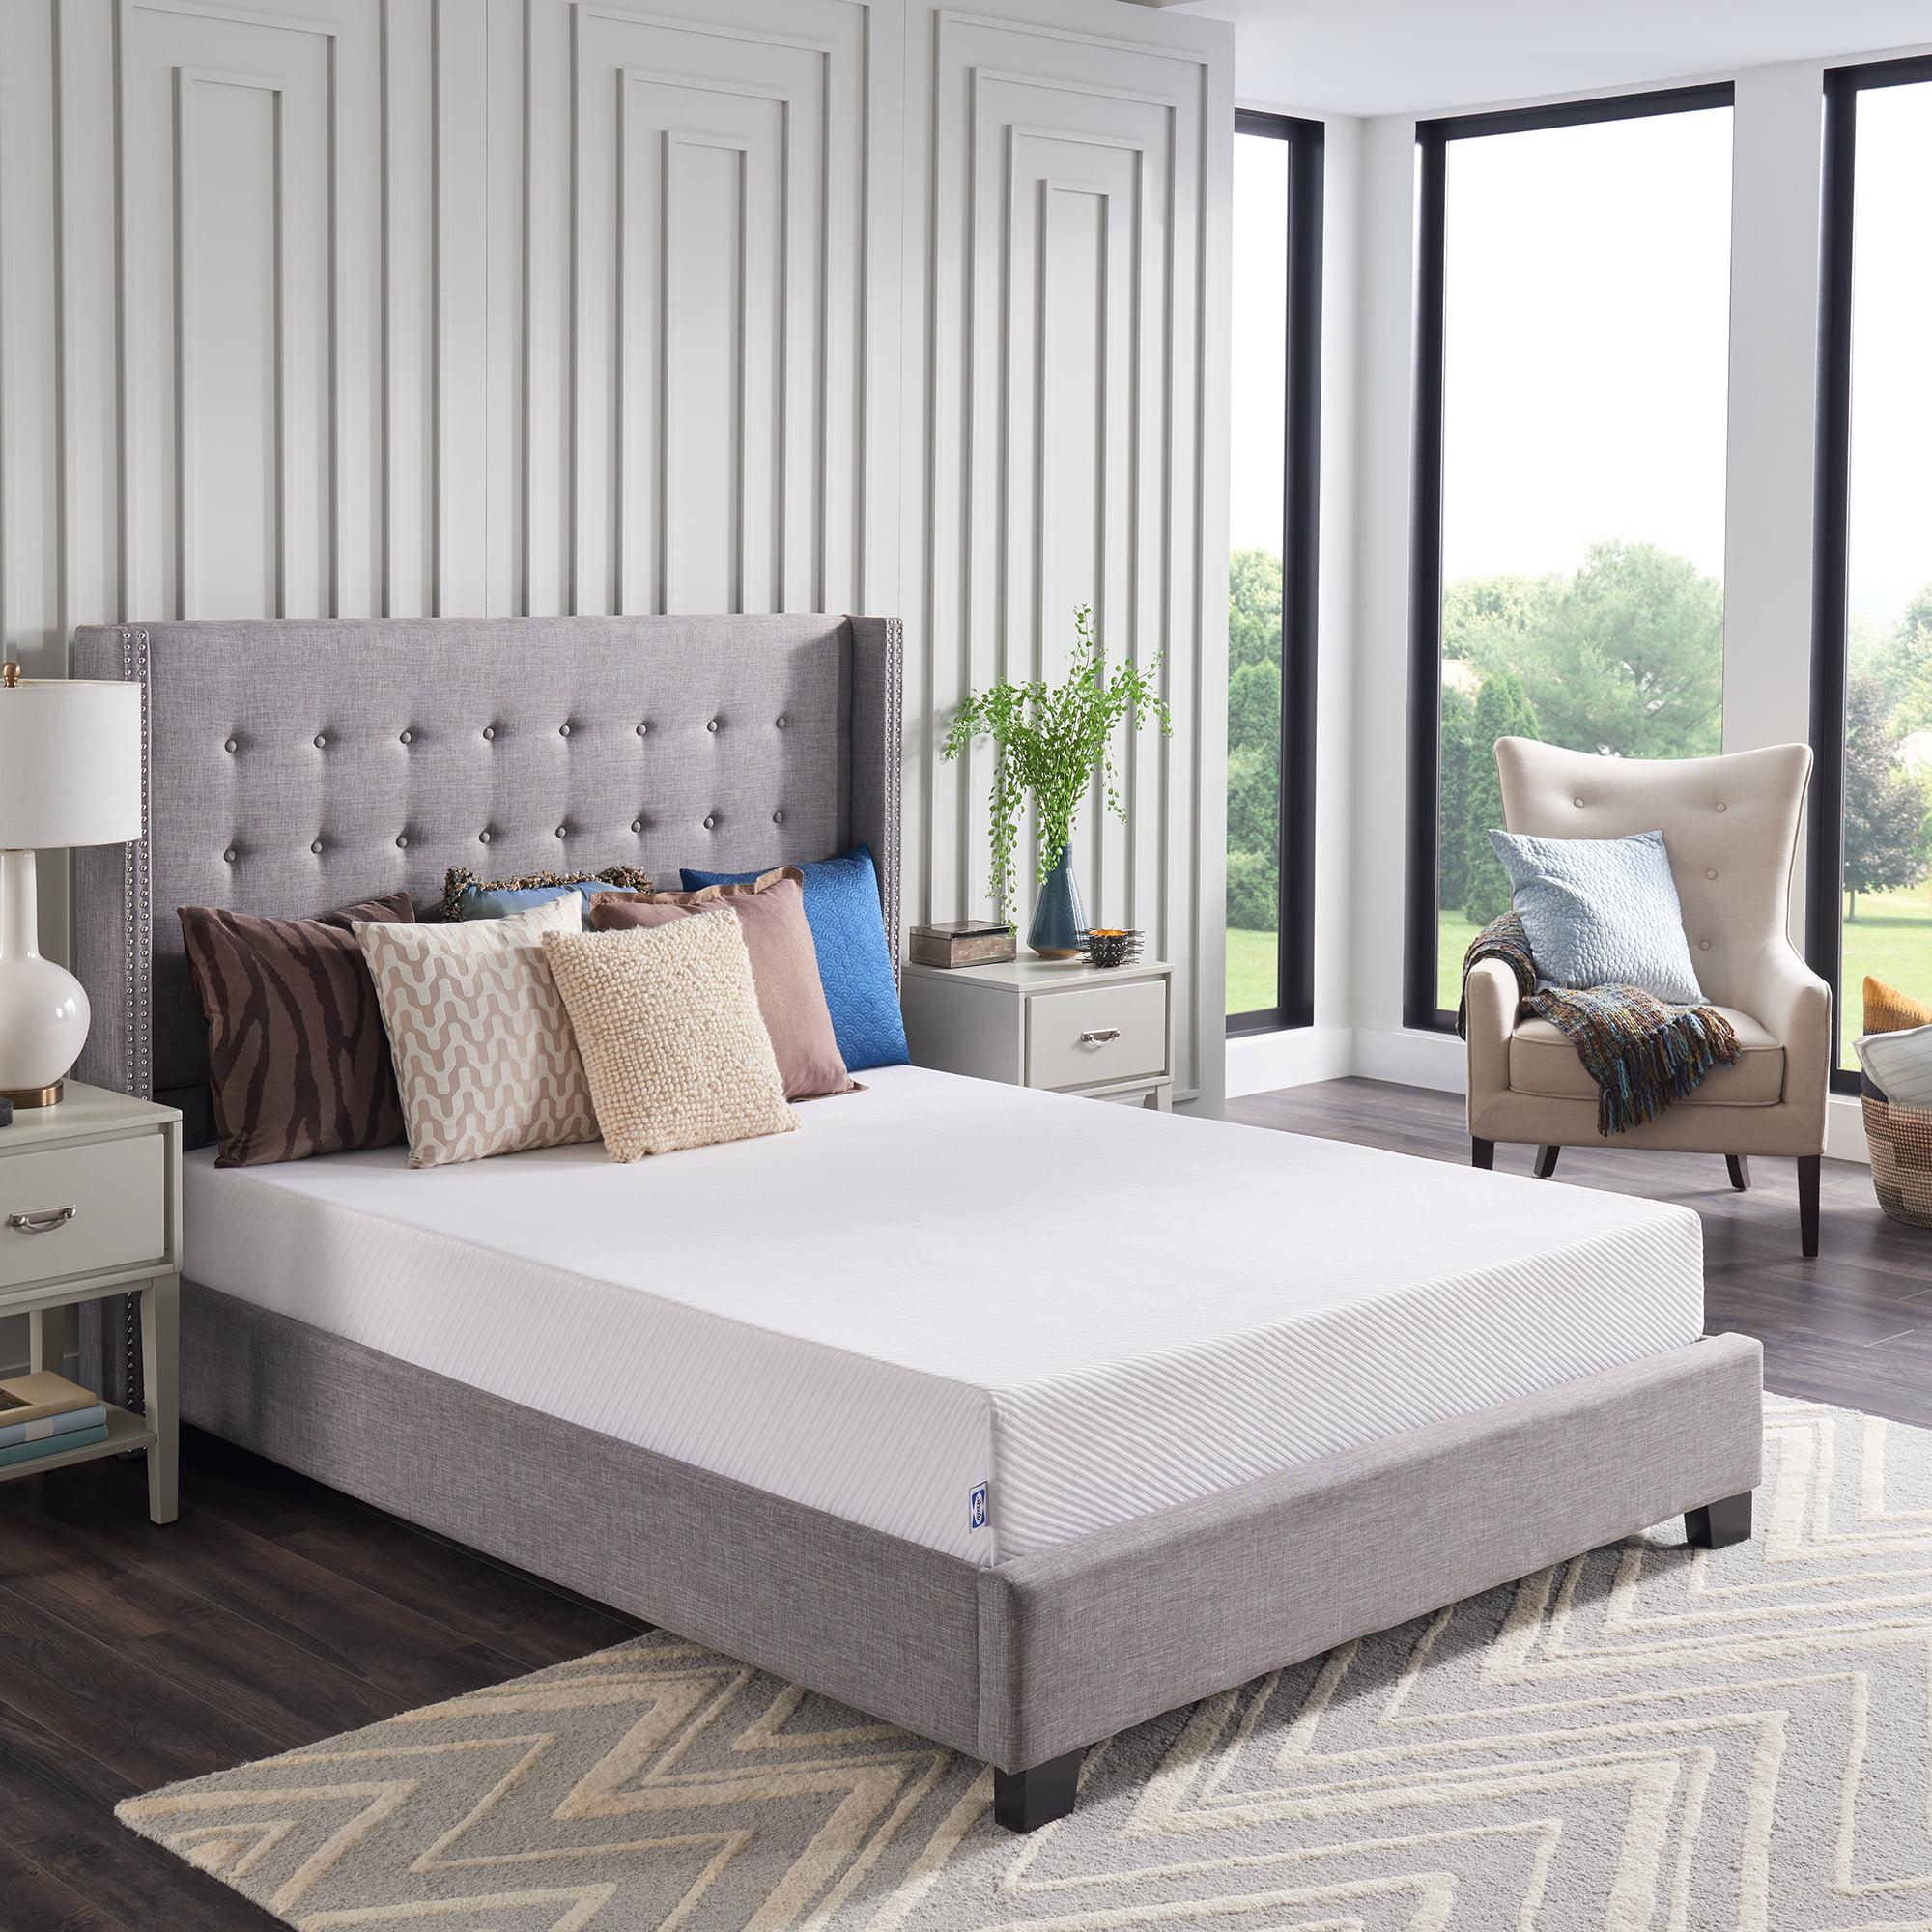 Sealy 8 Medium Firm Memory Foam Bed In